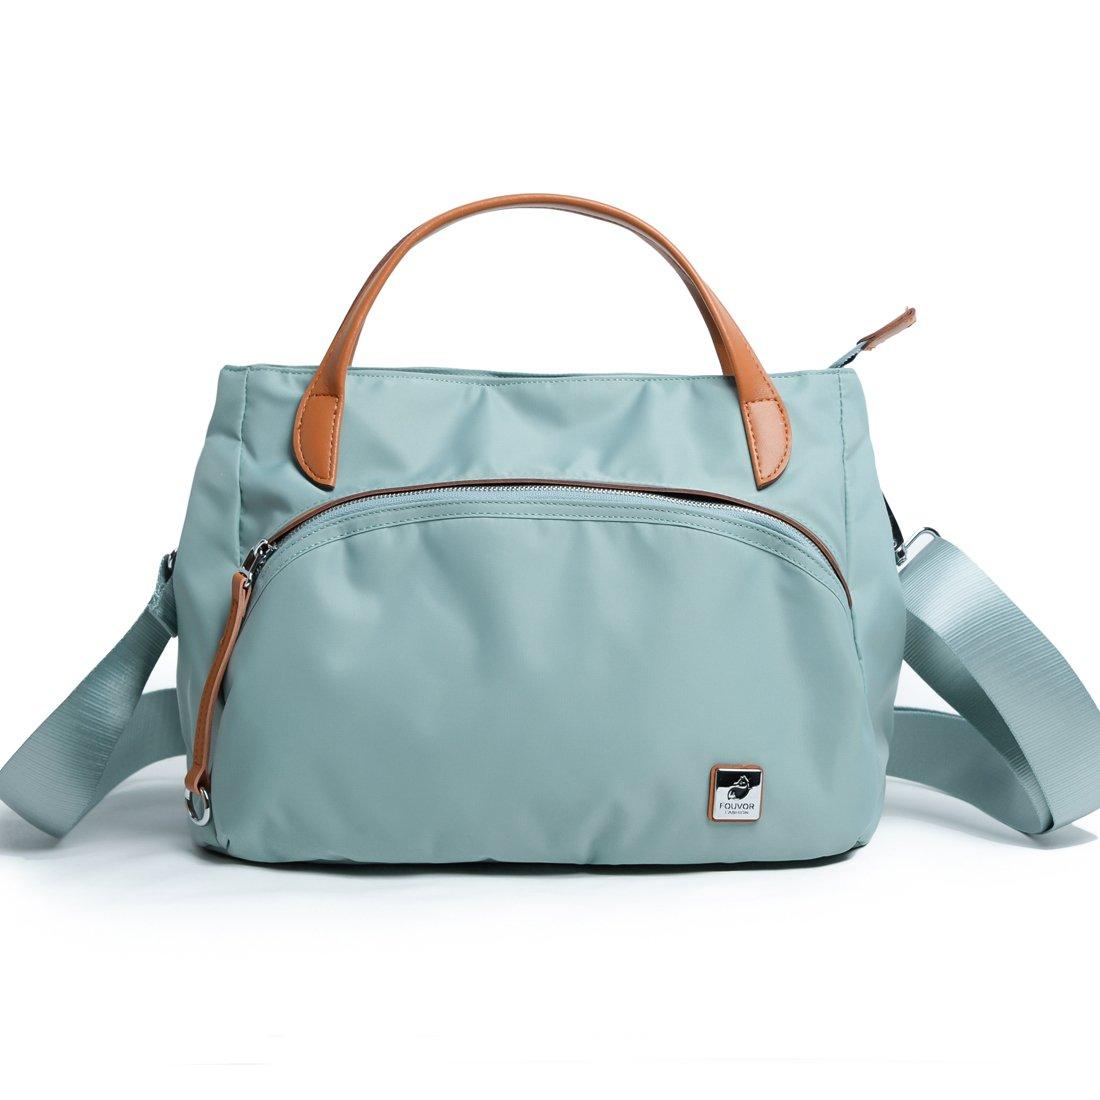 8859c685c8 Boomro crossbody tote bags lightweight nylon handbags waterproof messenger  shoulder bags handbags jpg 1100x1100 Lightweight tote